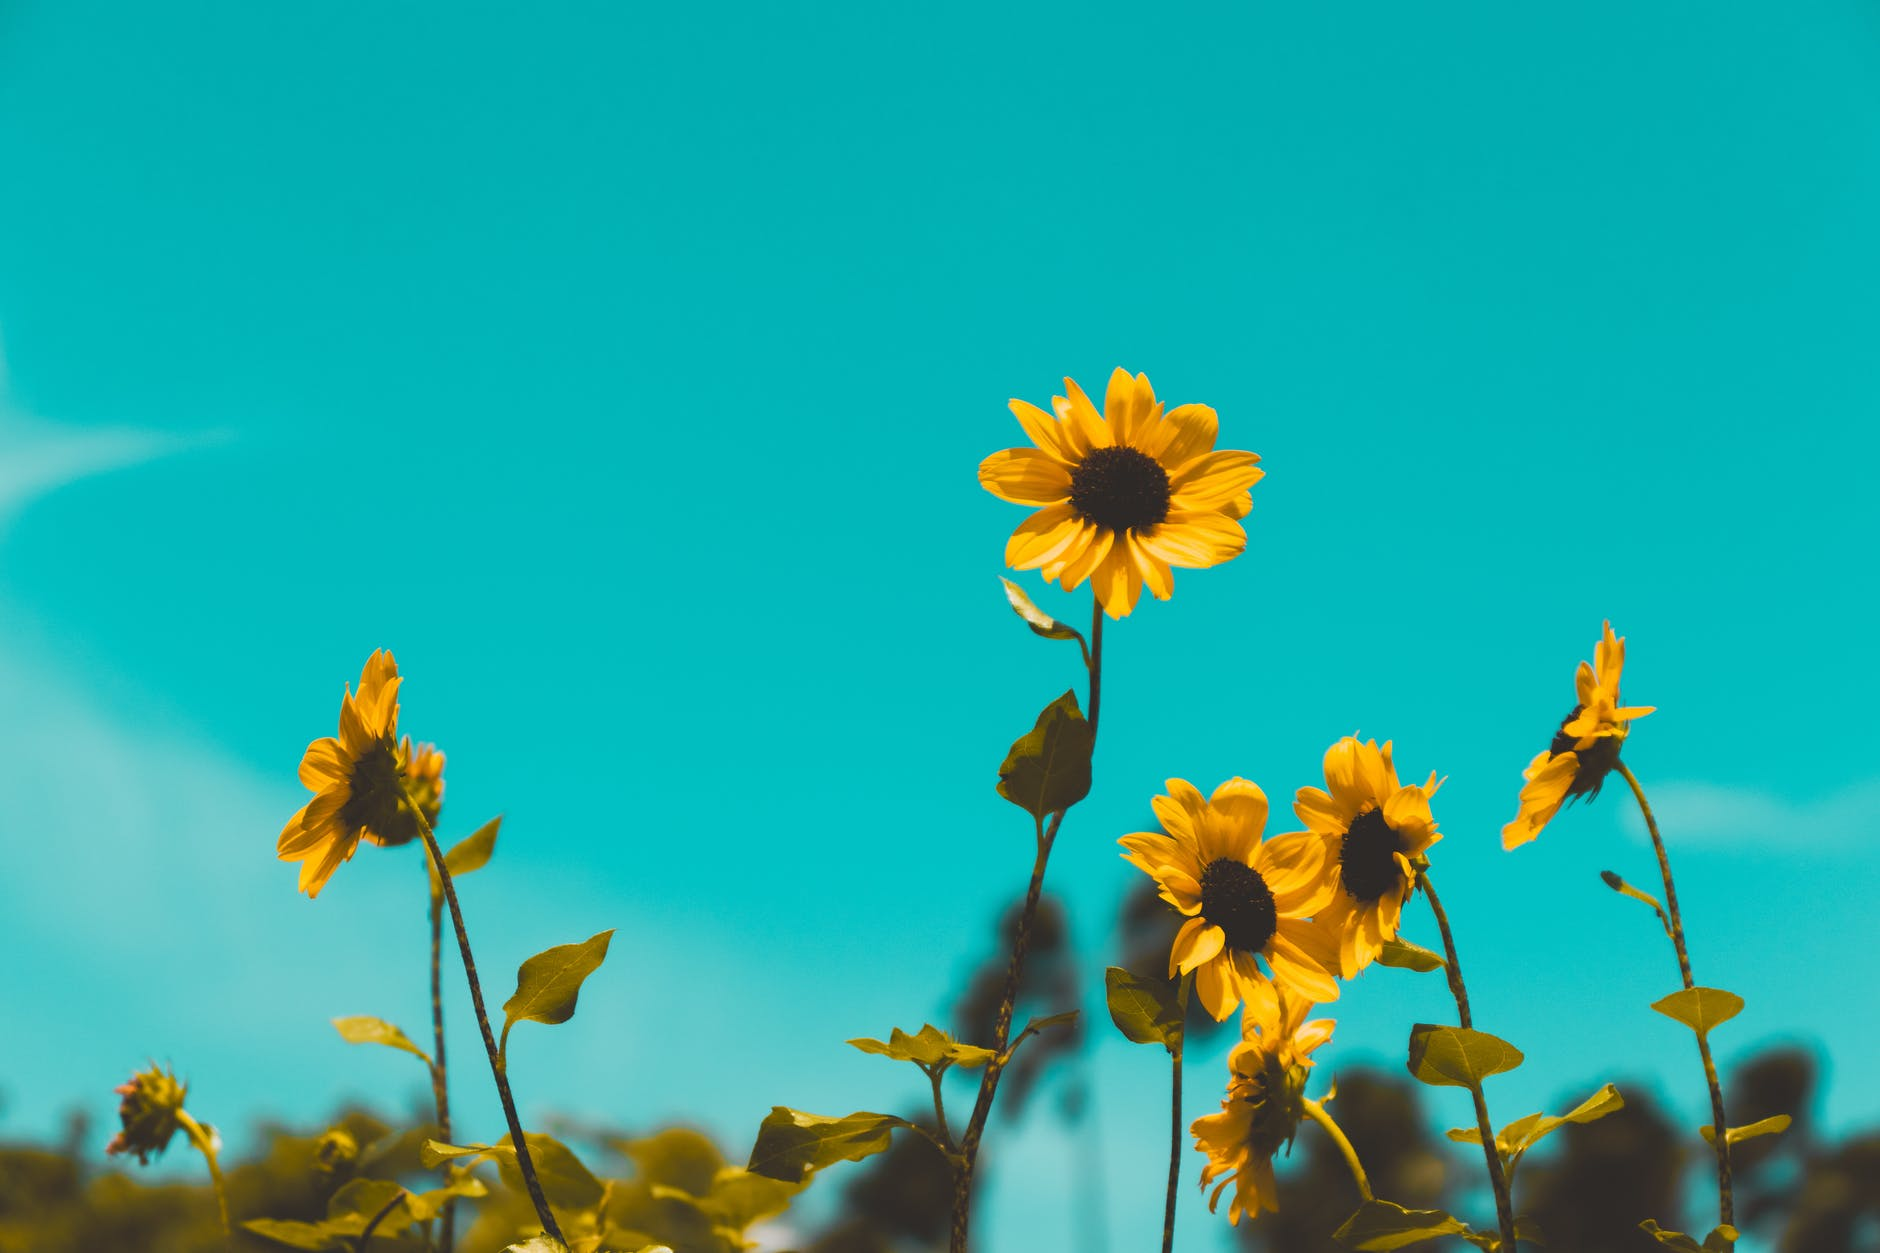 low angle photo of sunflowers